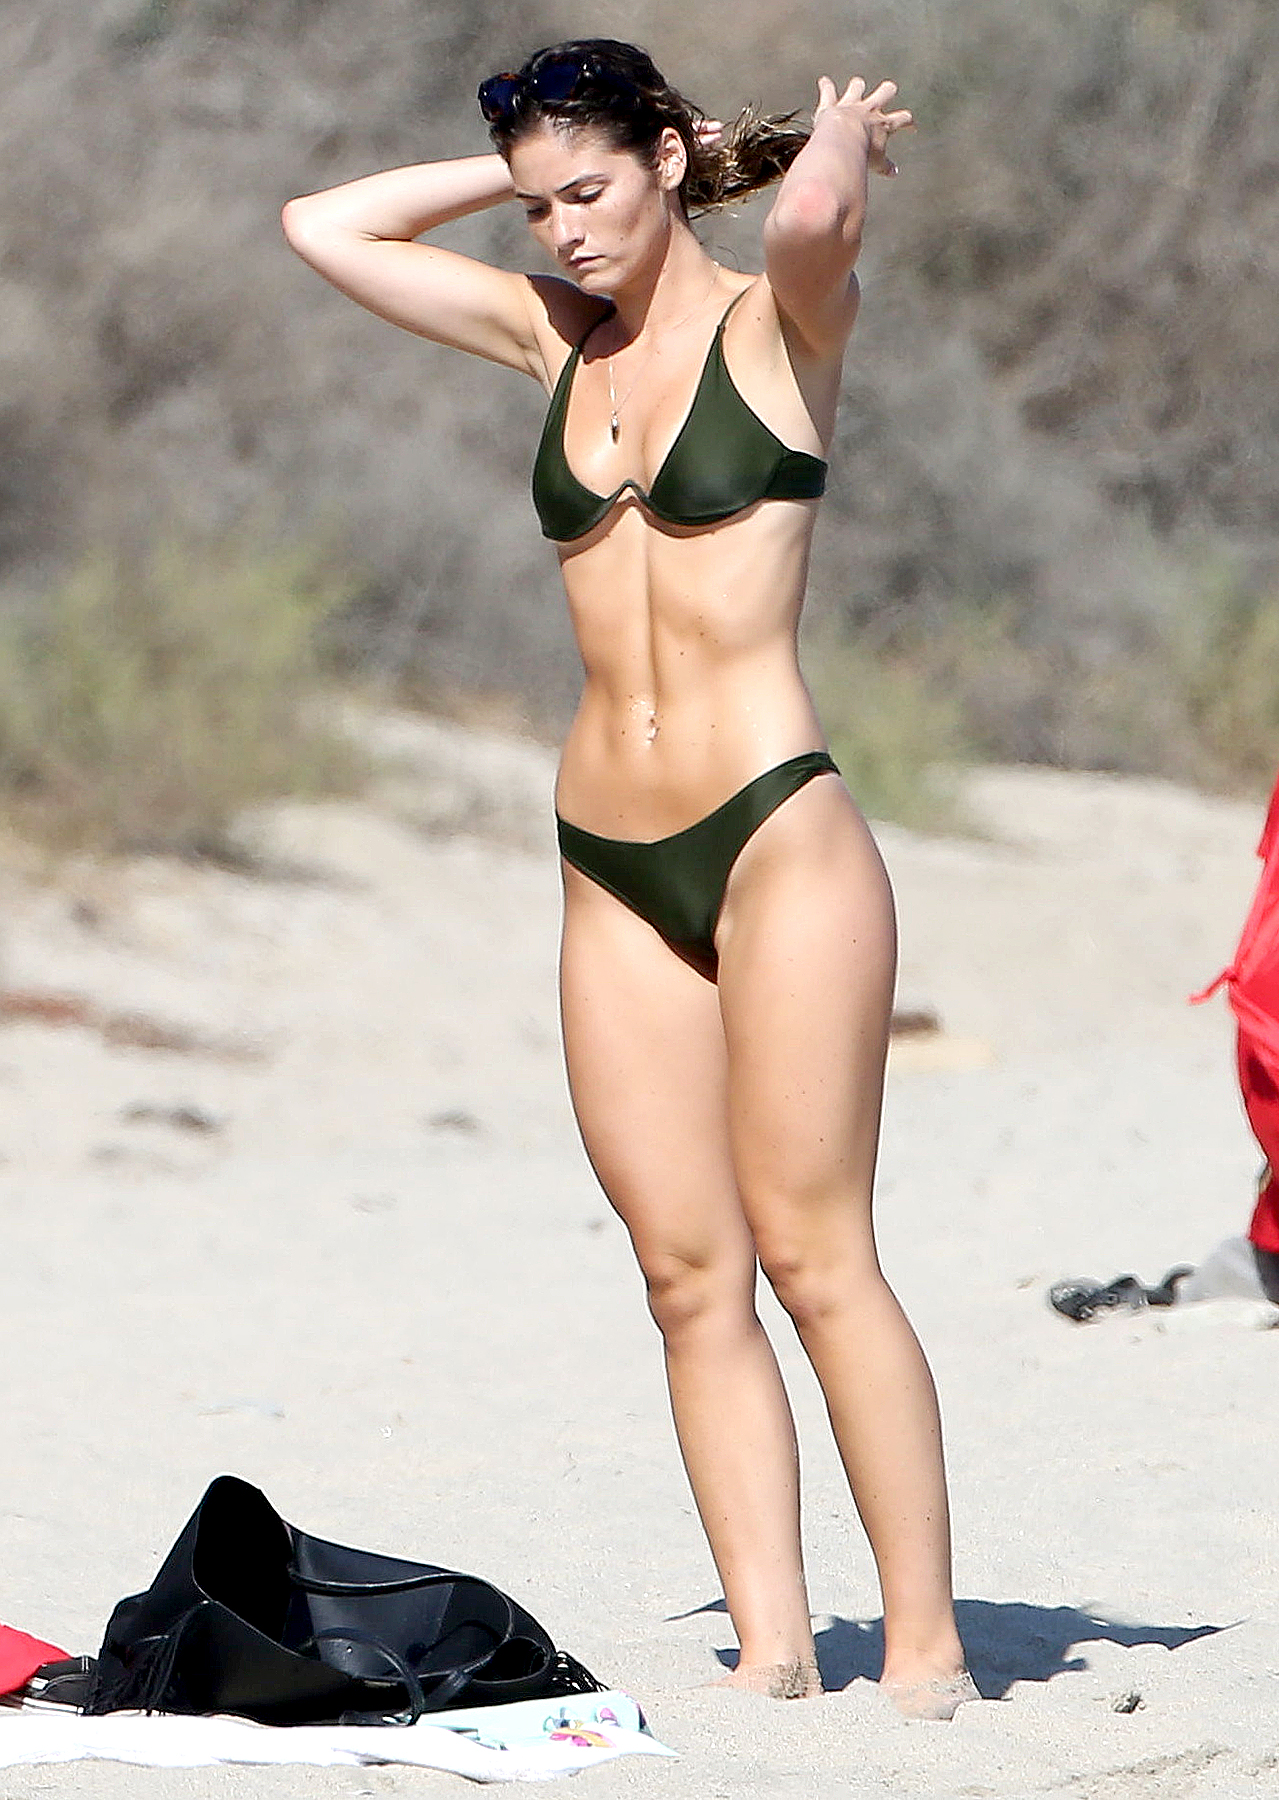 Watch my gf bikini